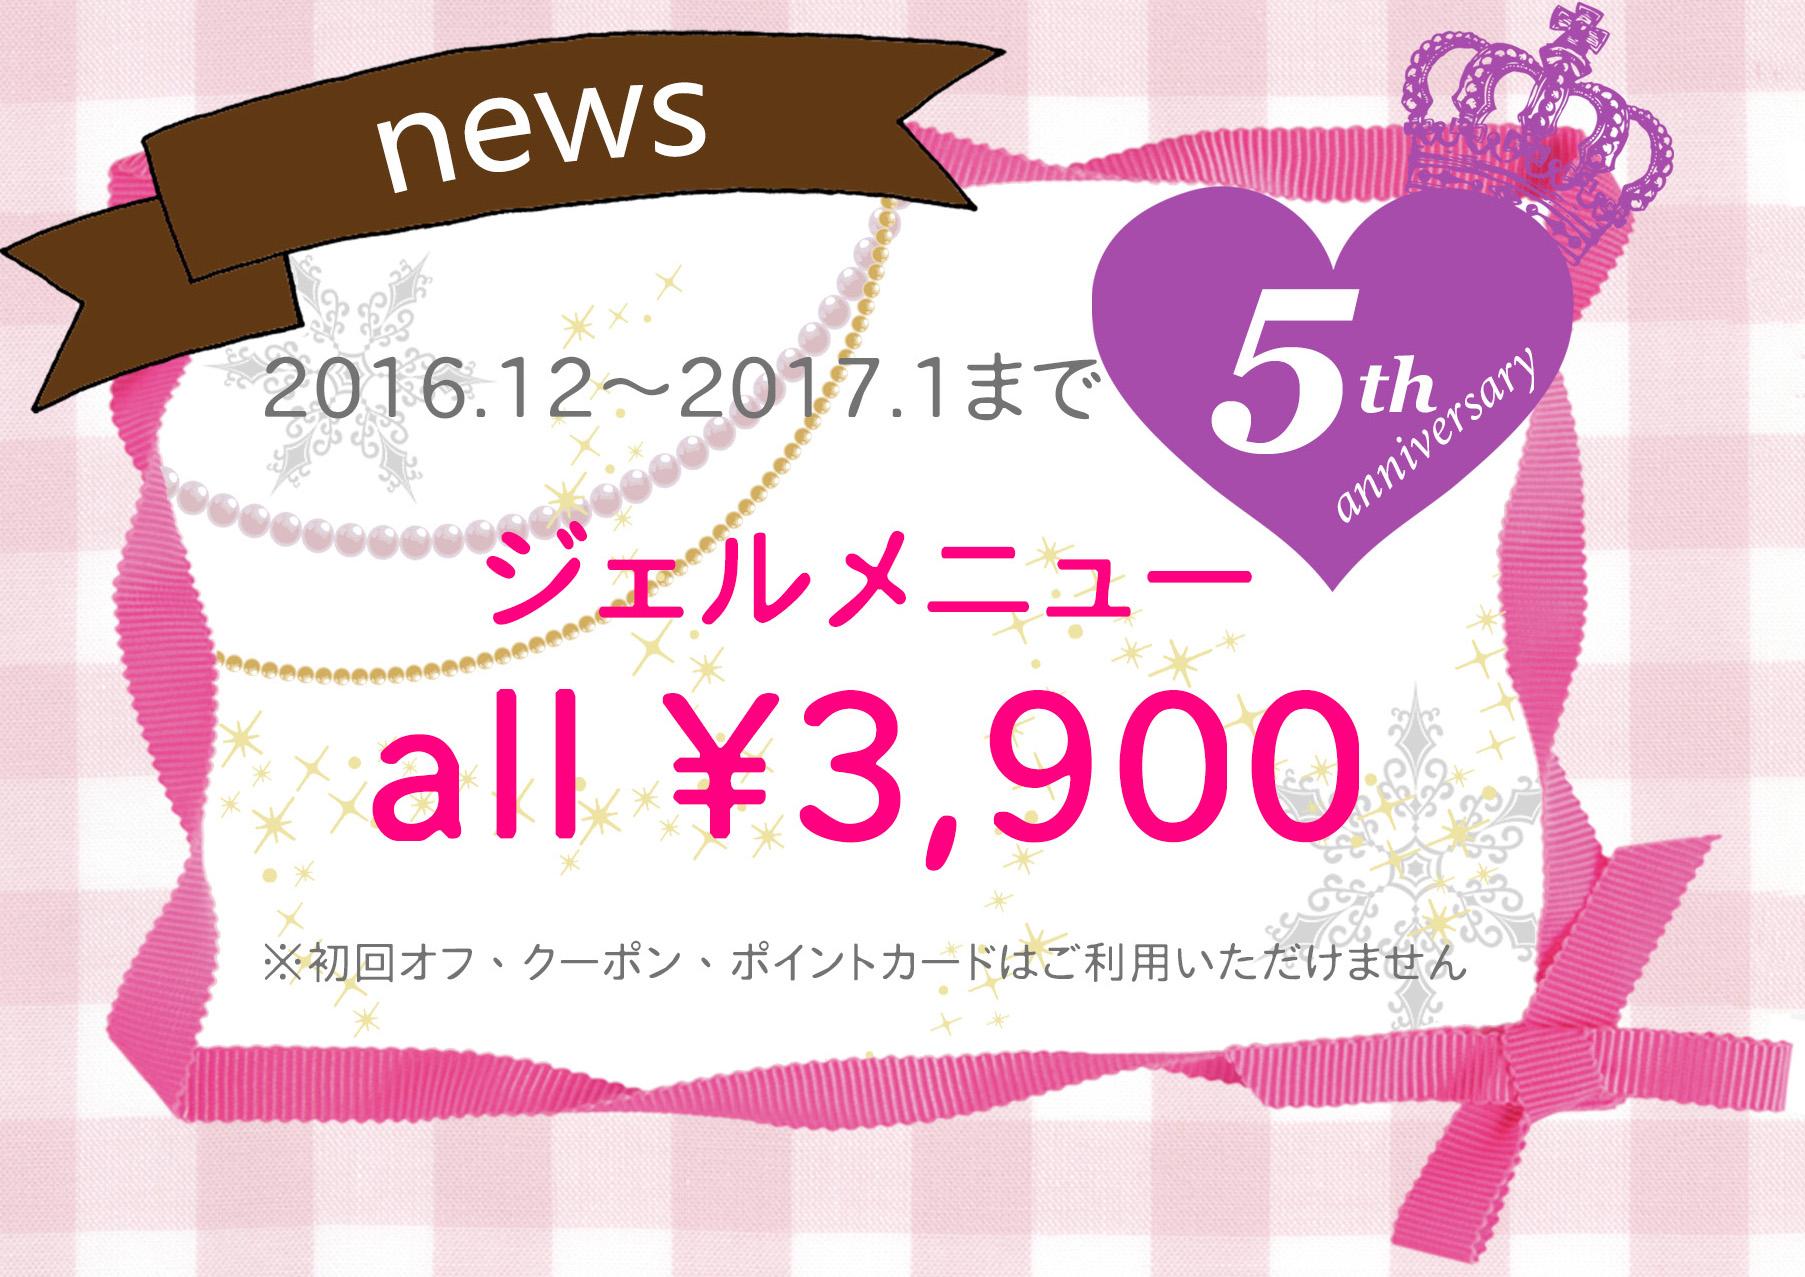 5th anniversary sale